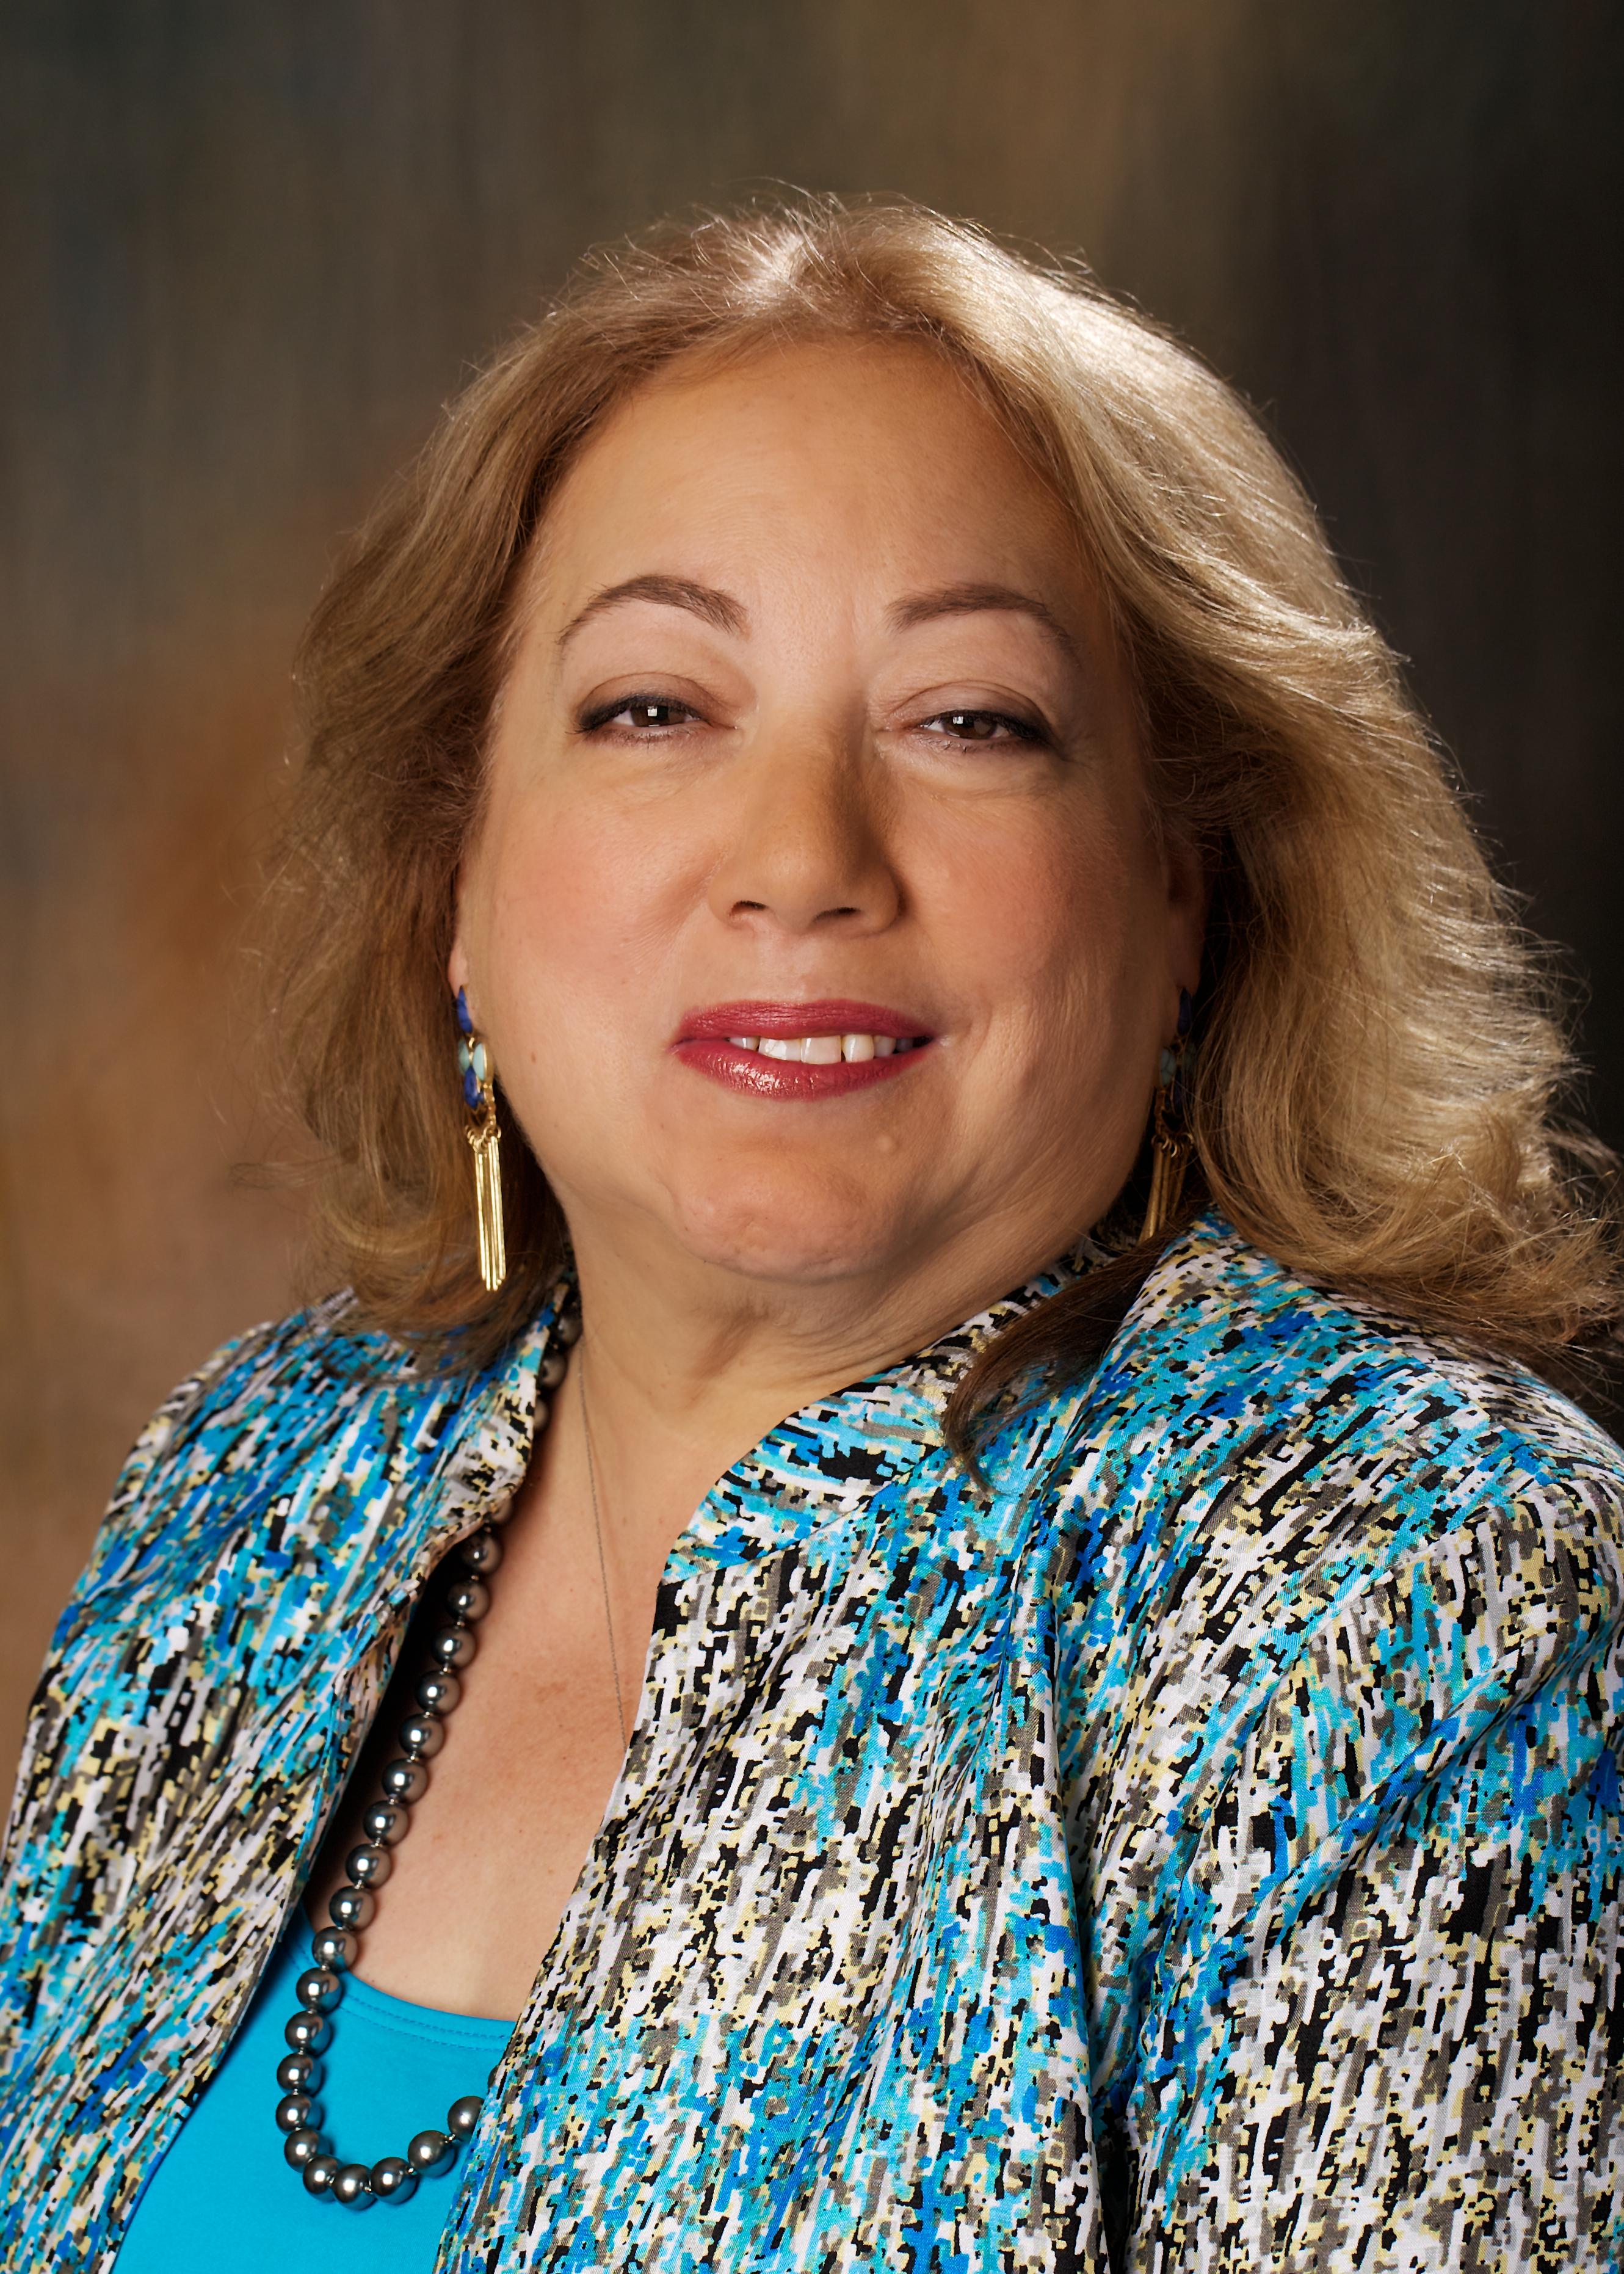 Asa Kelly Attorney In Utah - Ilene ferenczy esq apa cpc managing partner ferenczy benefits law center llp